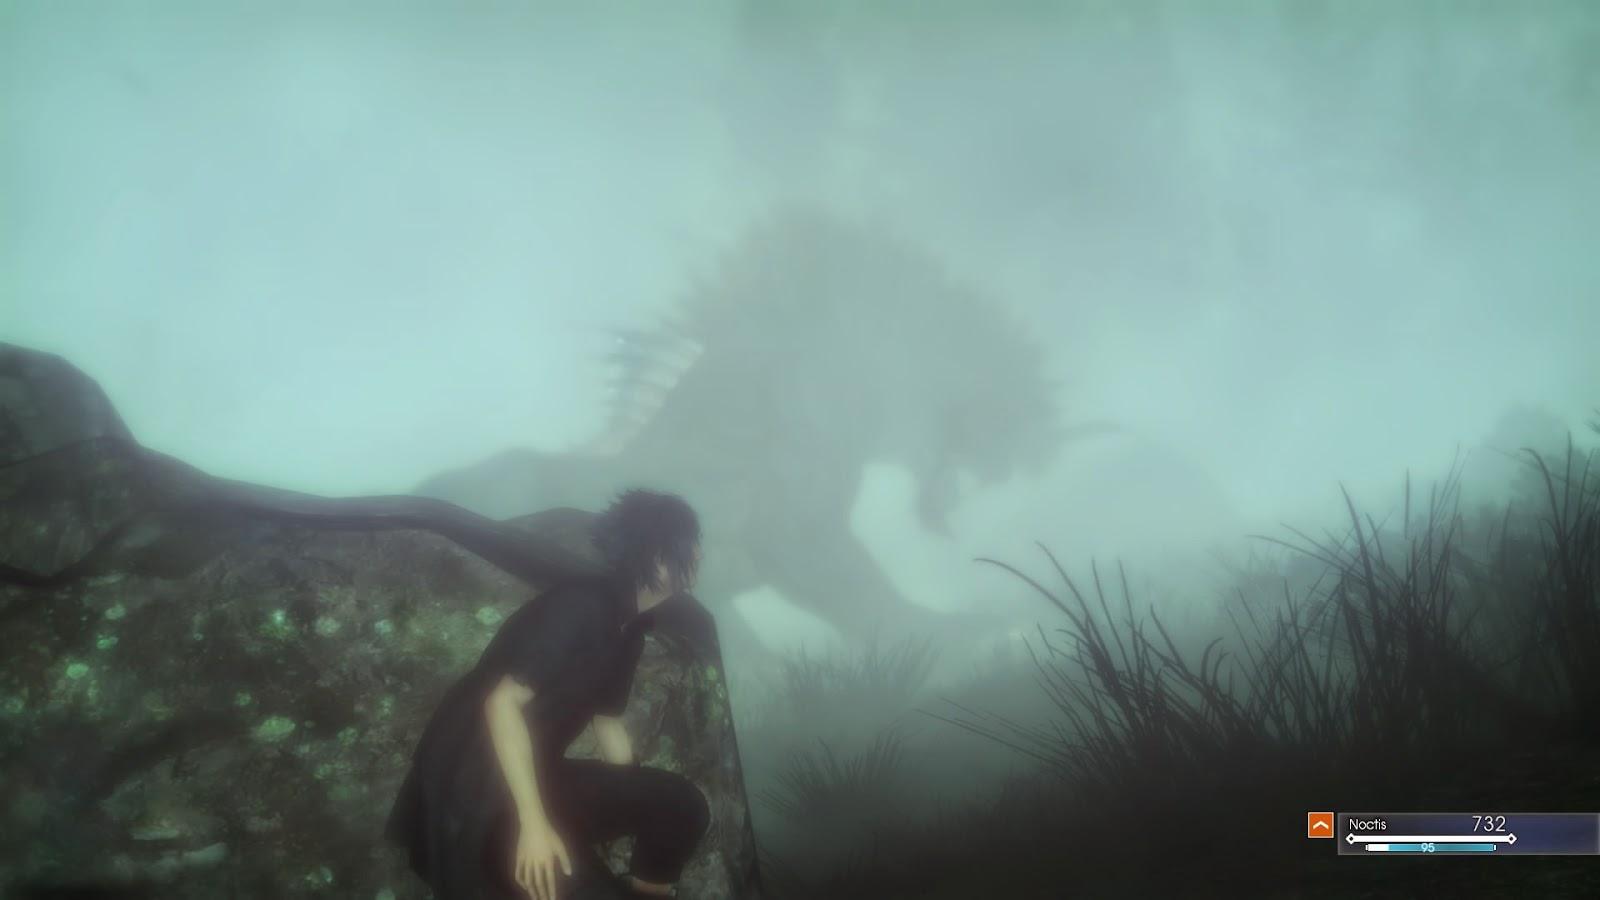 Square Enix game preview